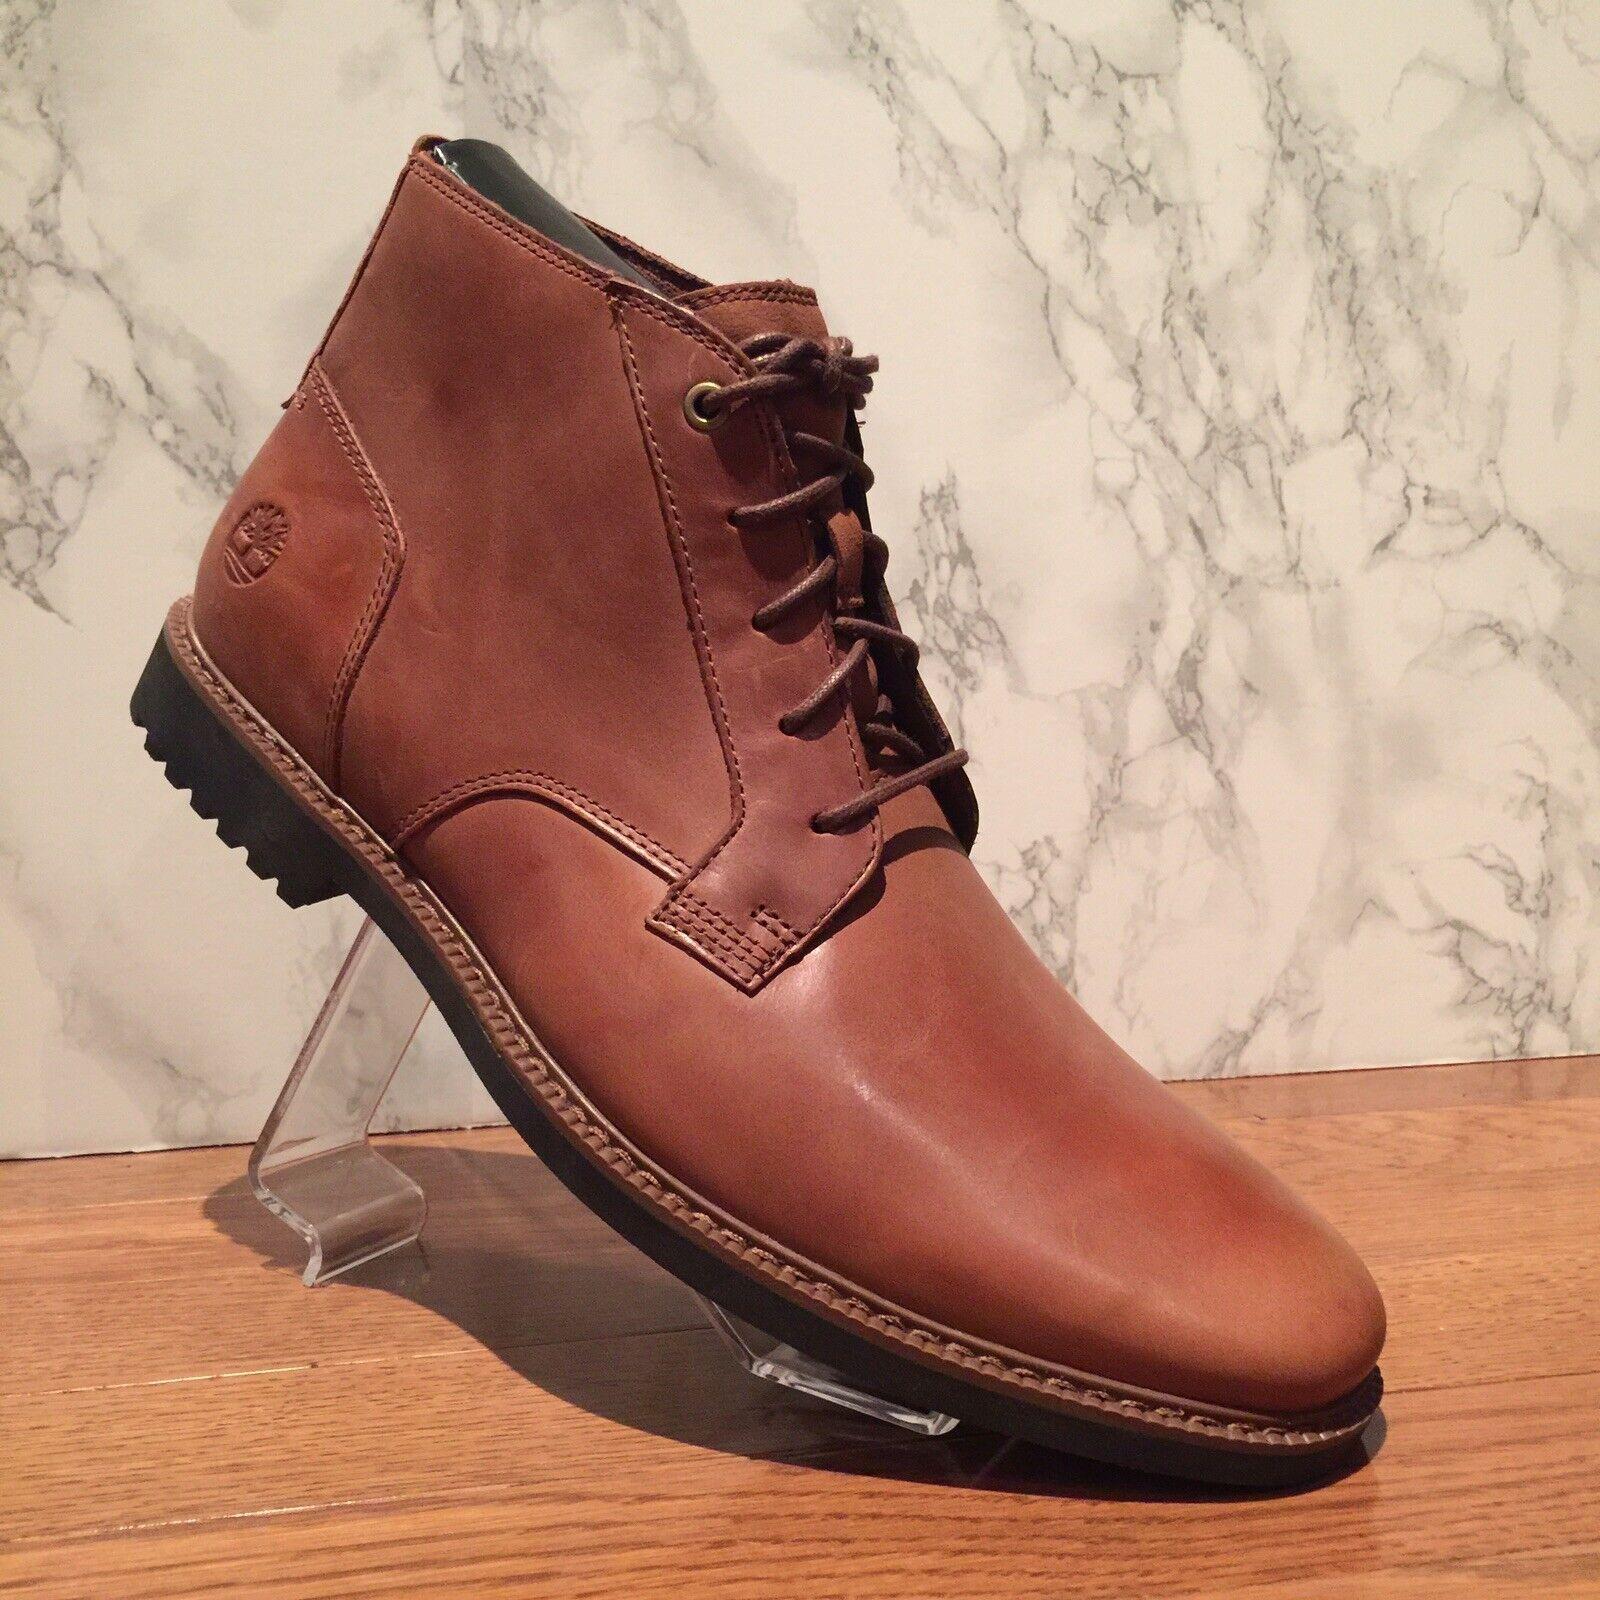 Timberland Men's Lafayette Park Men's Premium Chukka Boot Shoes A1QE2. SZ:10 3